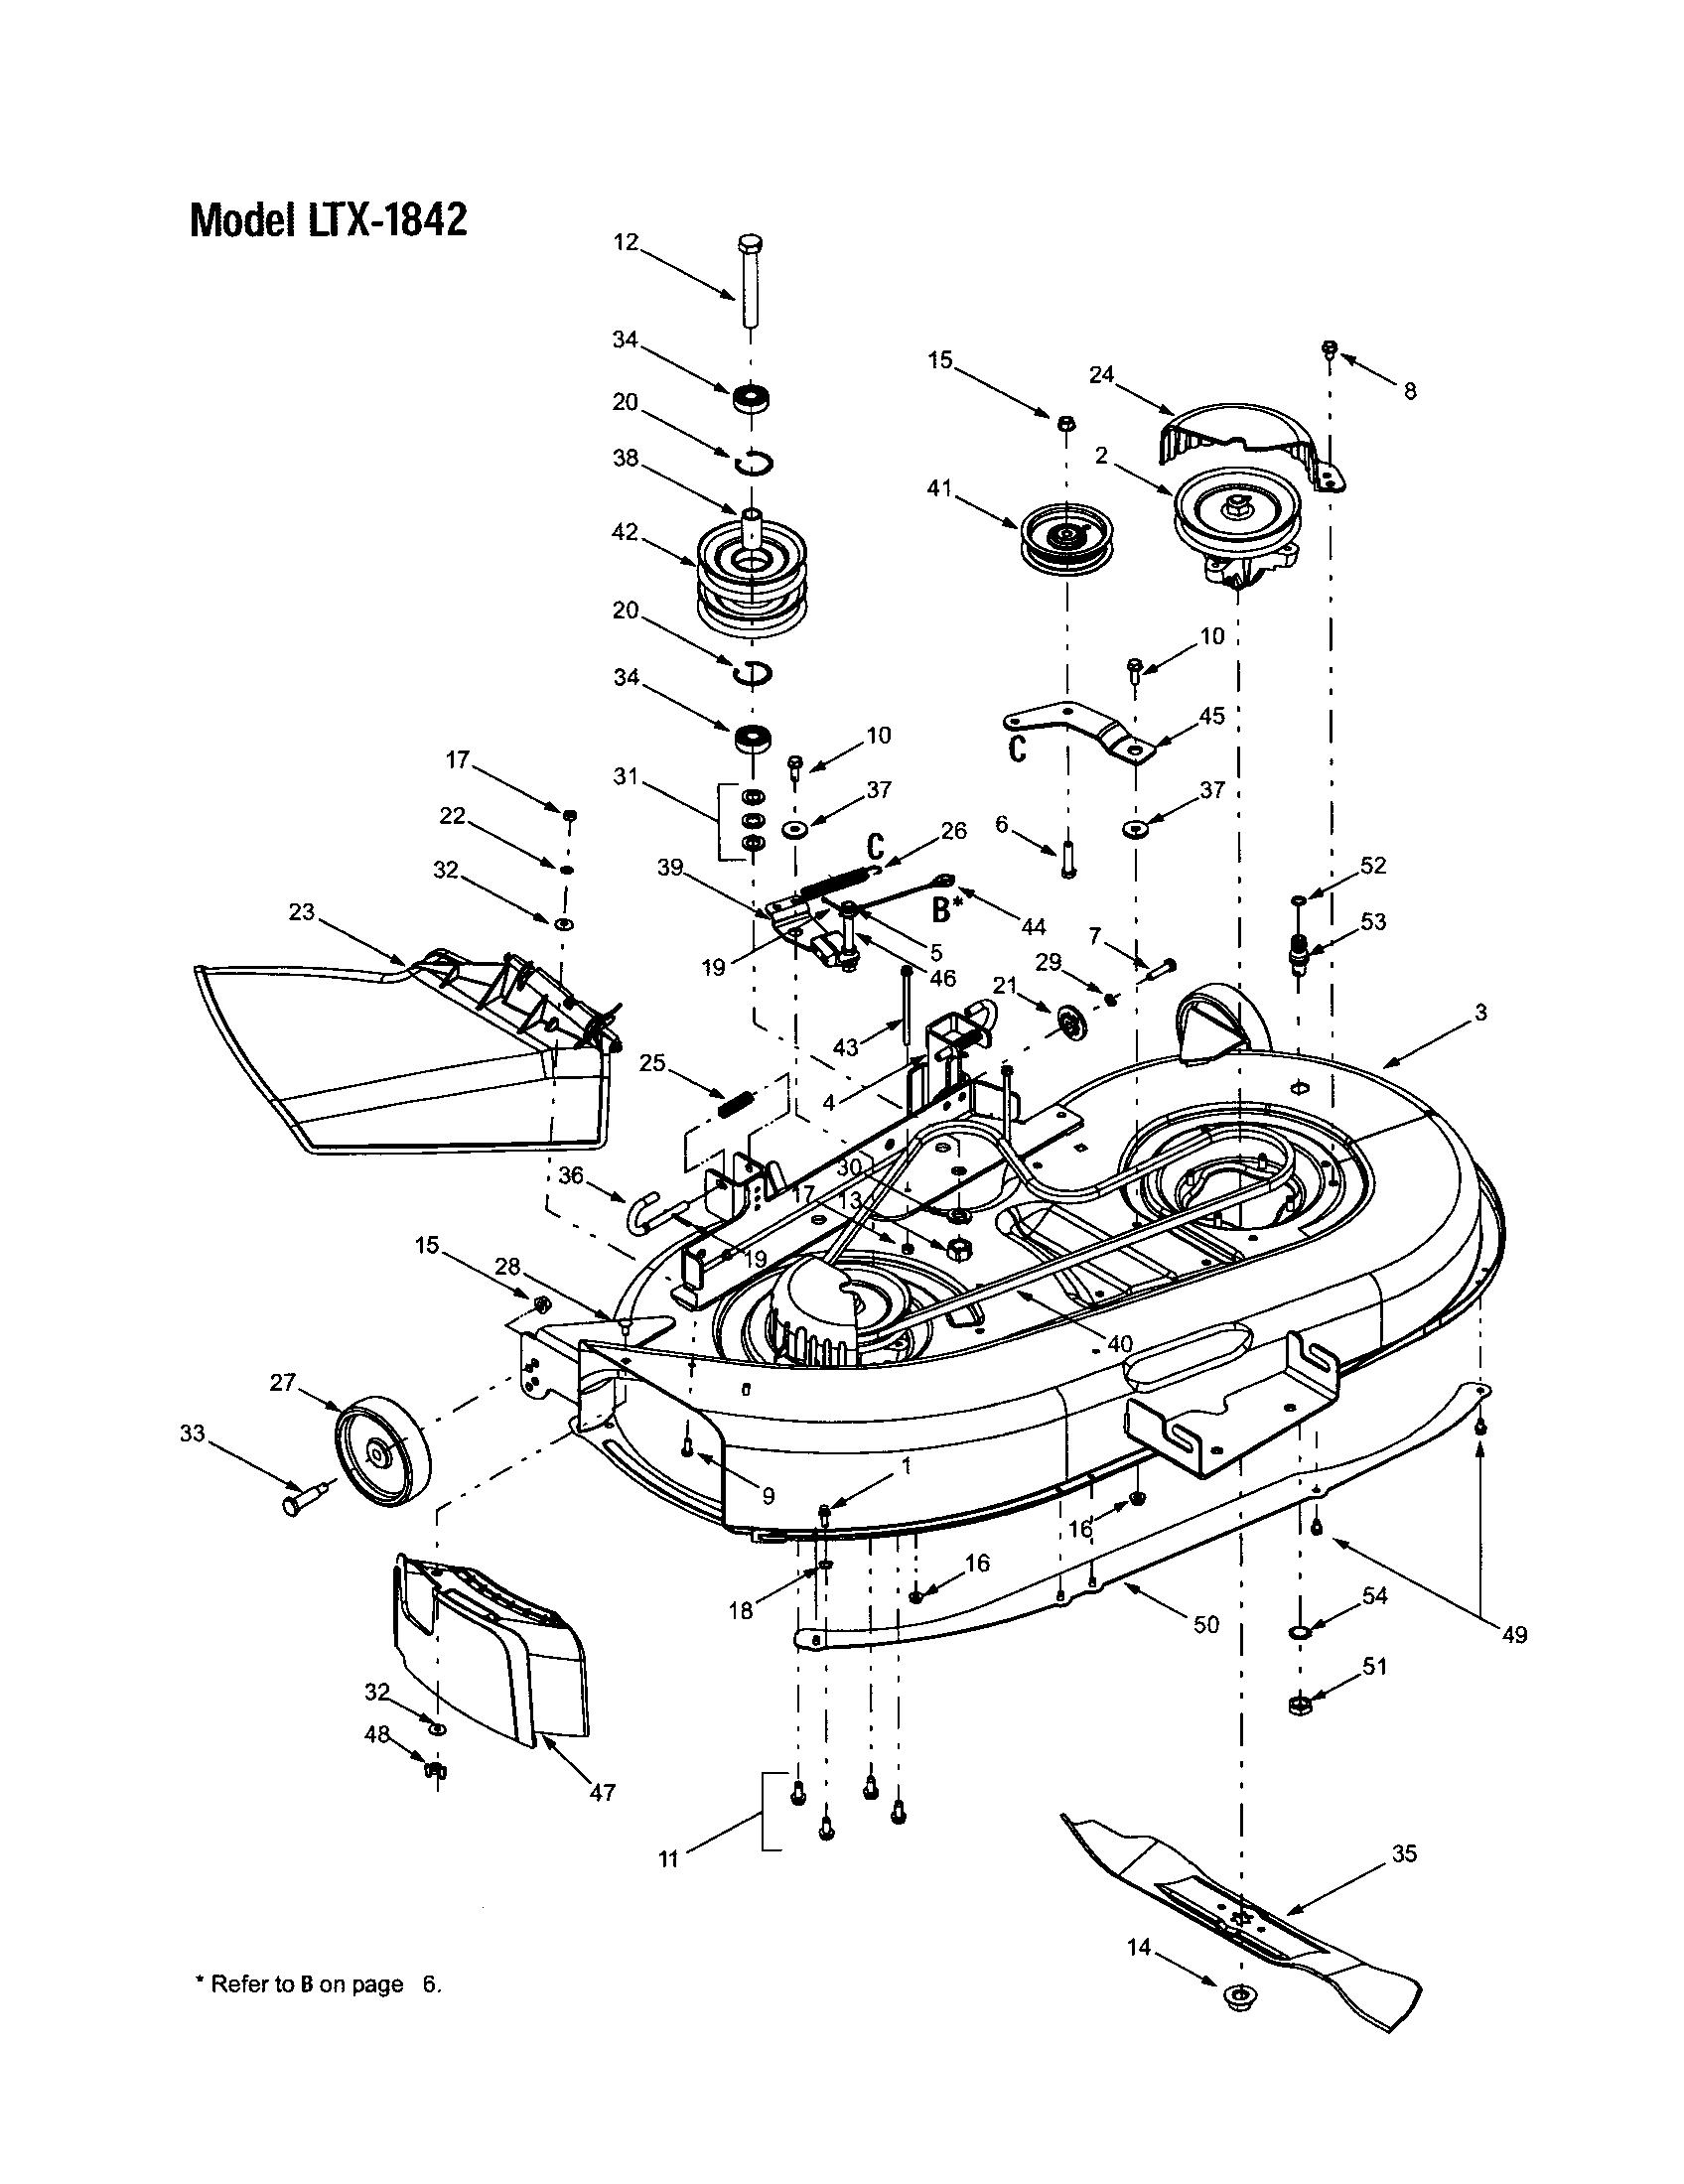 Troy bilt model ltx 1842 electrical wiring diagram troy bilt ltx 1842 specs cairearts